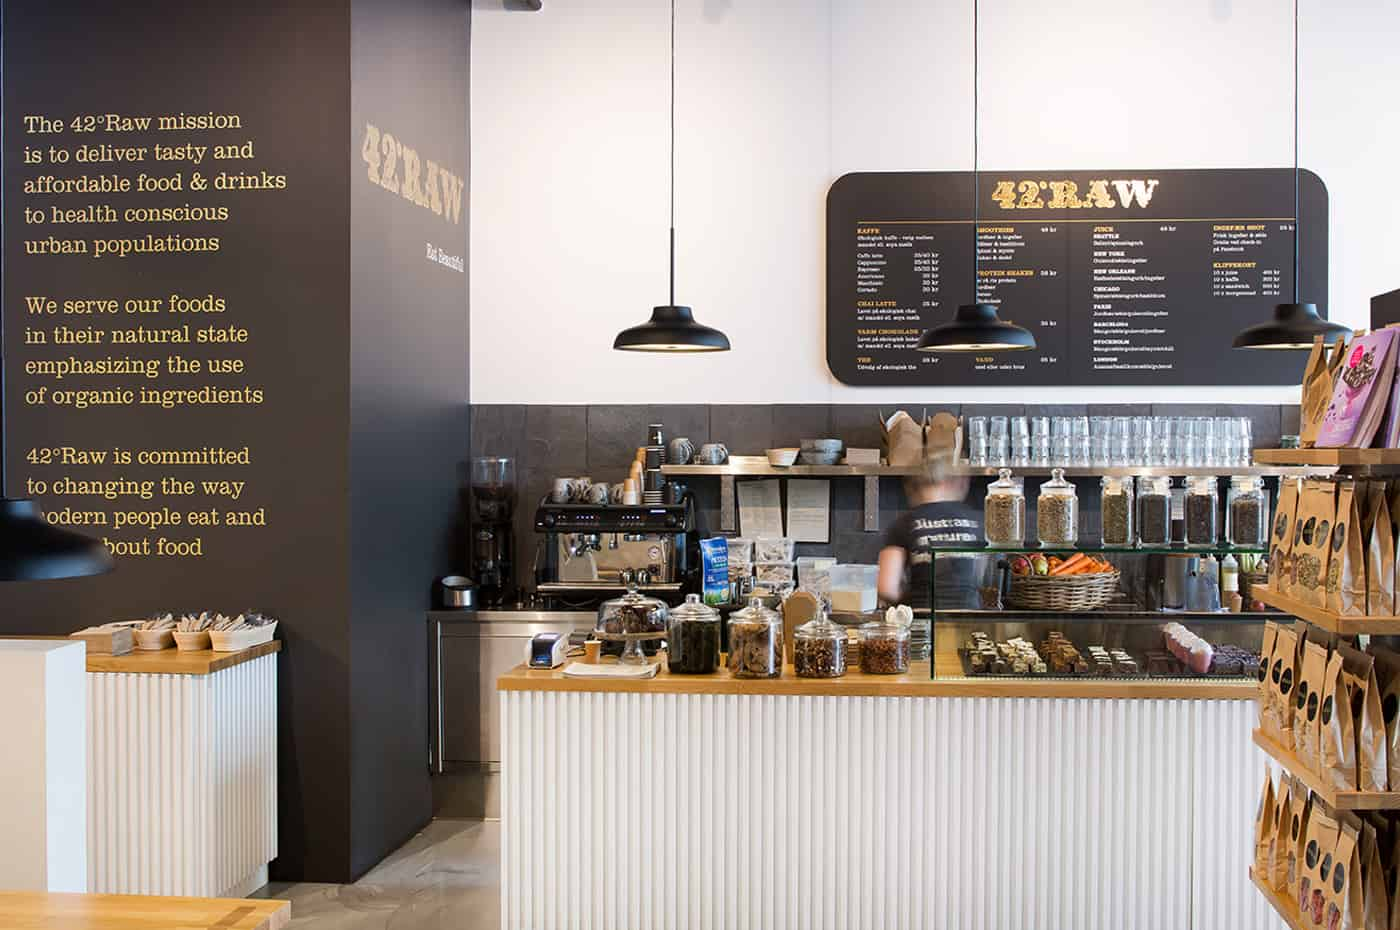 RITAarch, 42RAW, 42RAW Hellerup, Indretning, Spaceplanning, Cafeindretning, Resturantindretning, Cafe, Skranke, Cafedisk, Specialinventar, Specialdesign